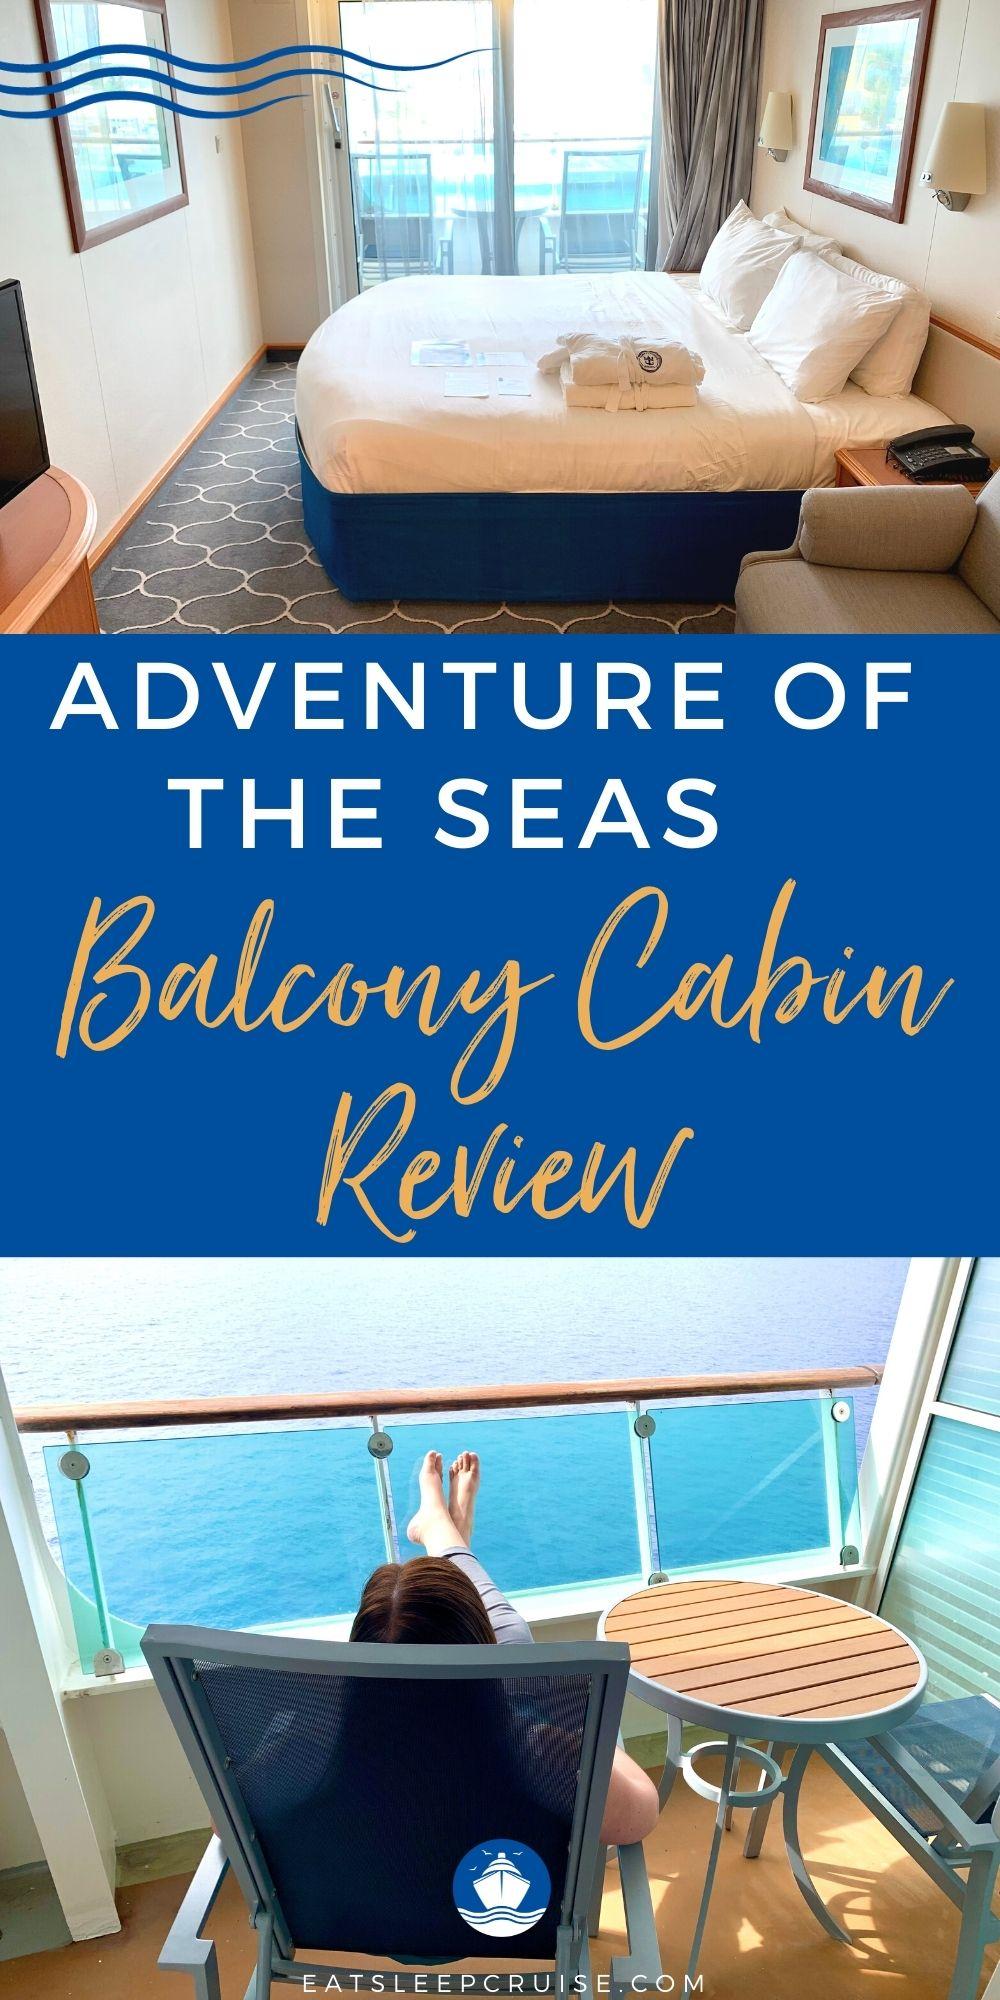 Adventure of the Seas Spacious Ocean View Balcony Cabin Review